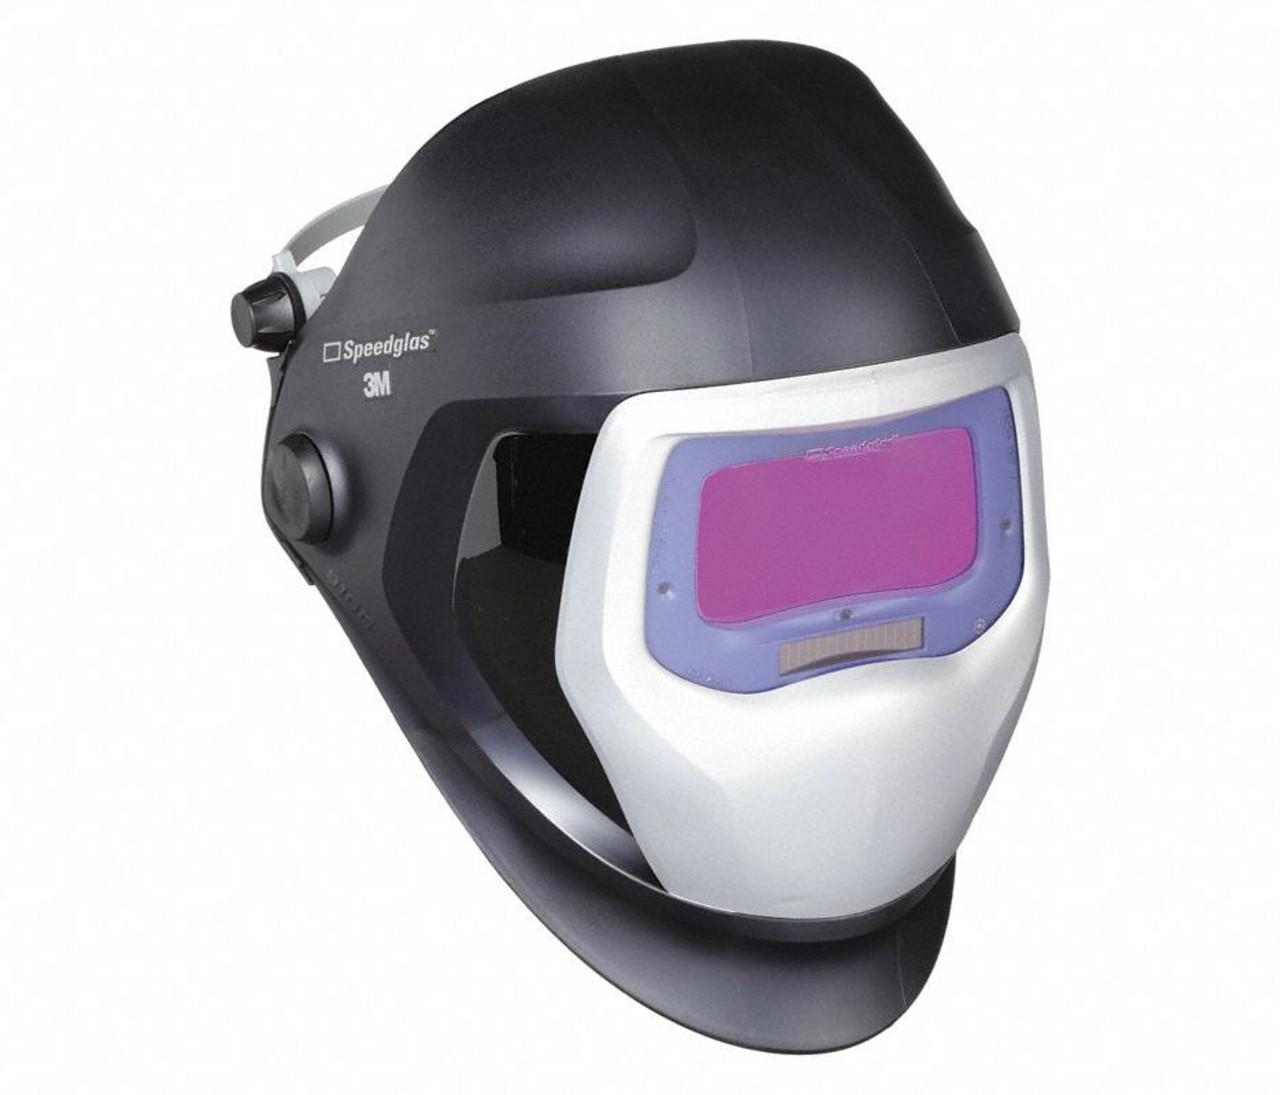 3m welding mask